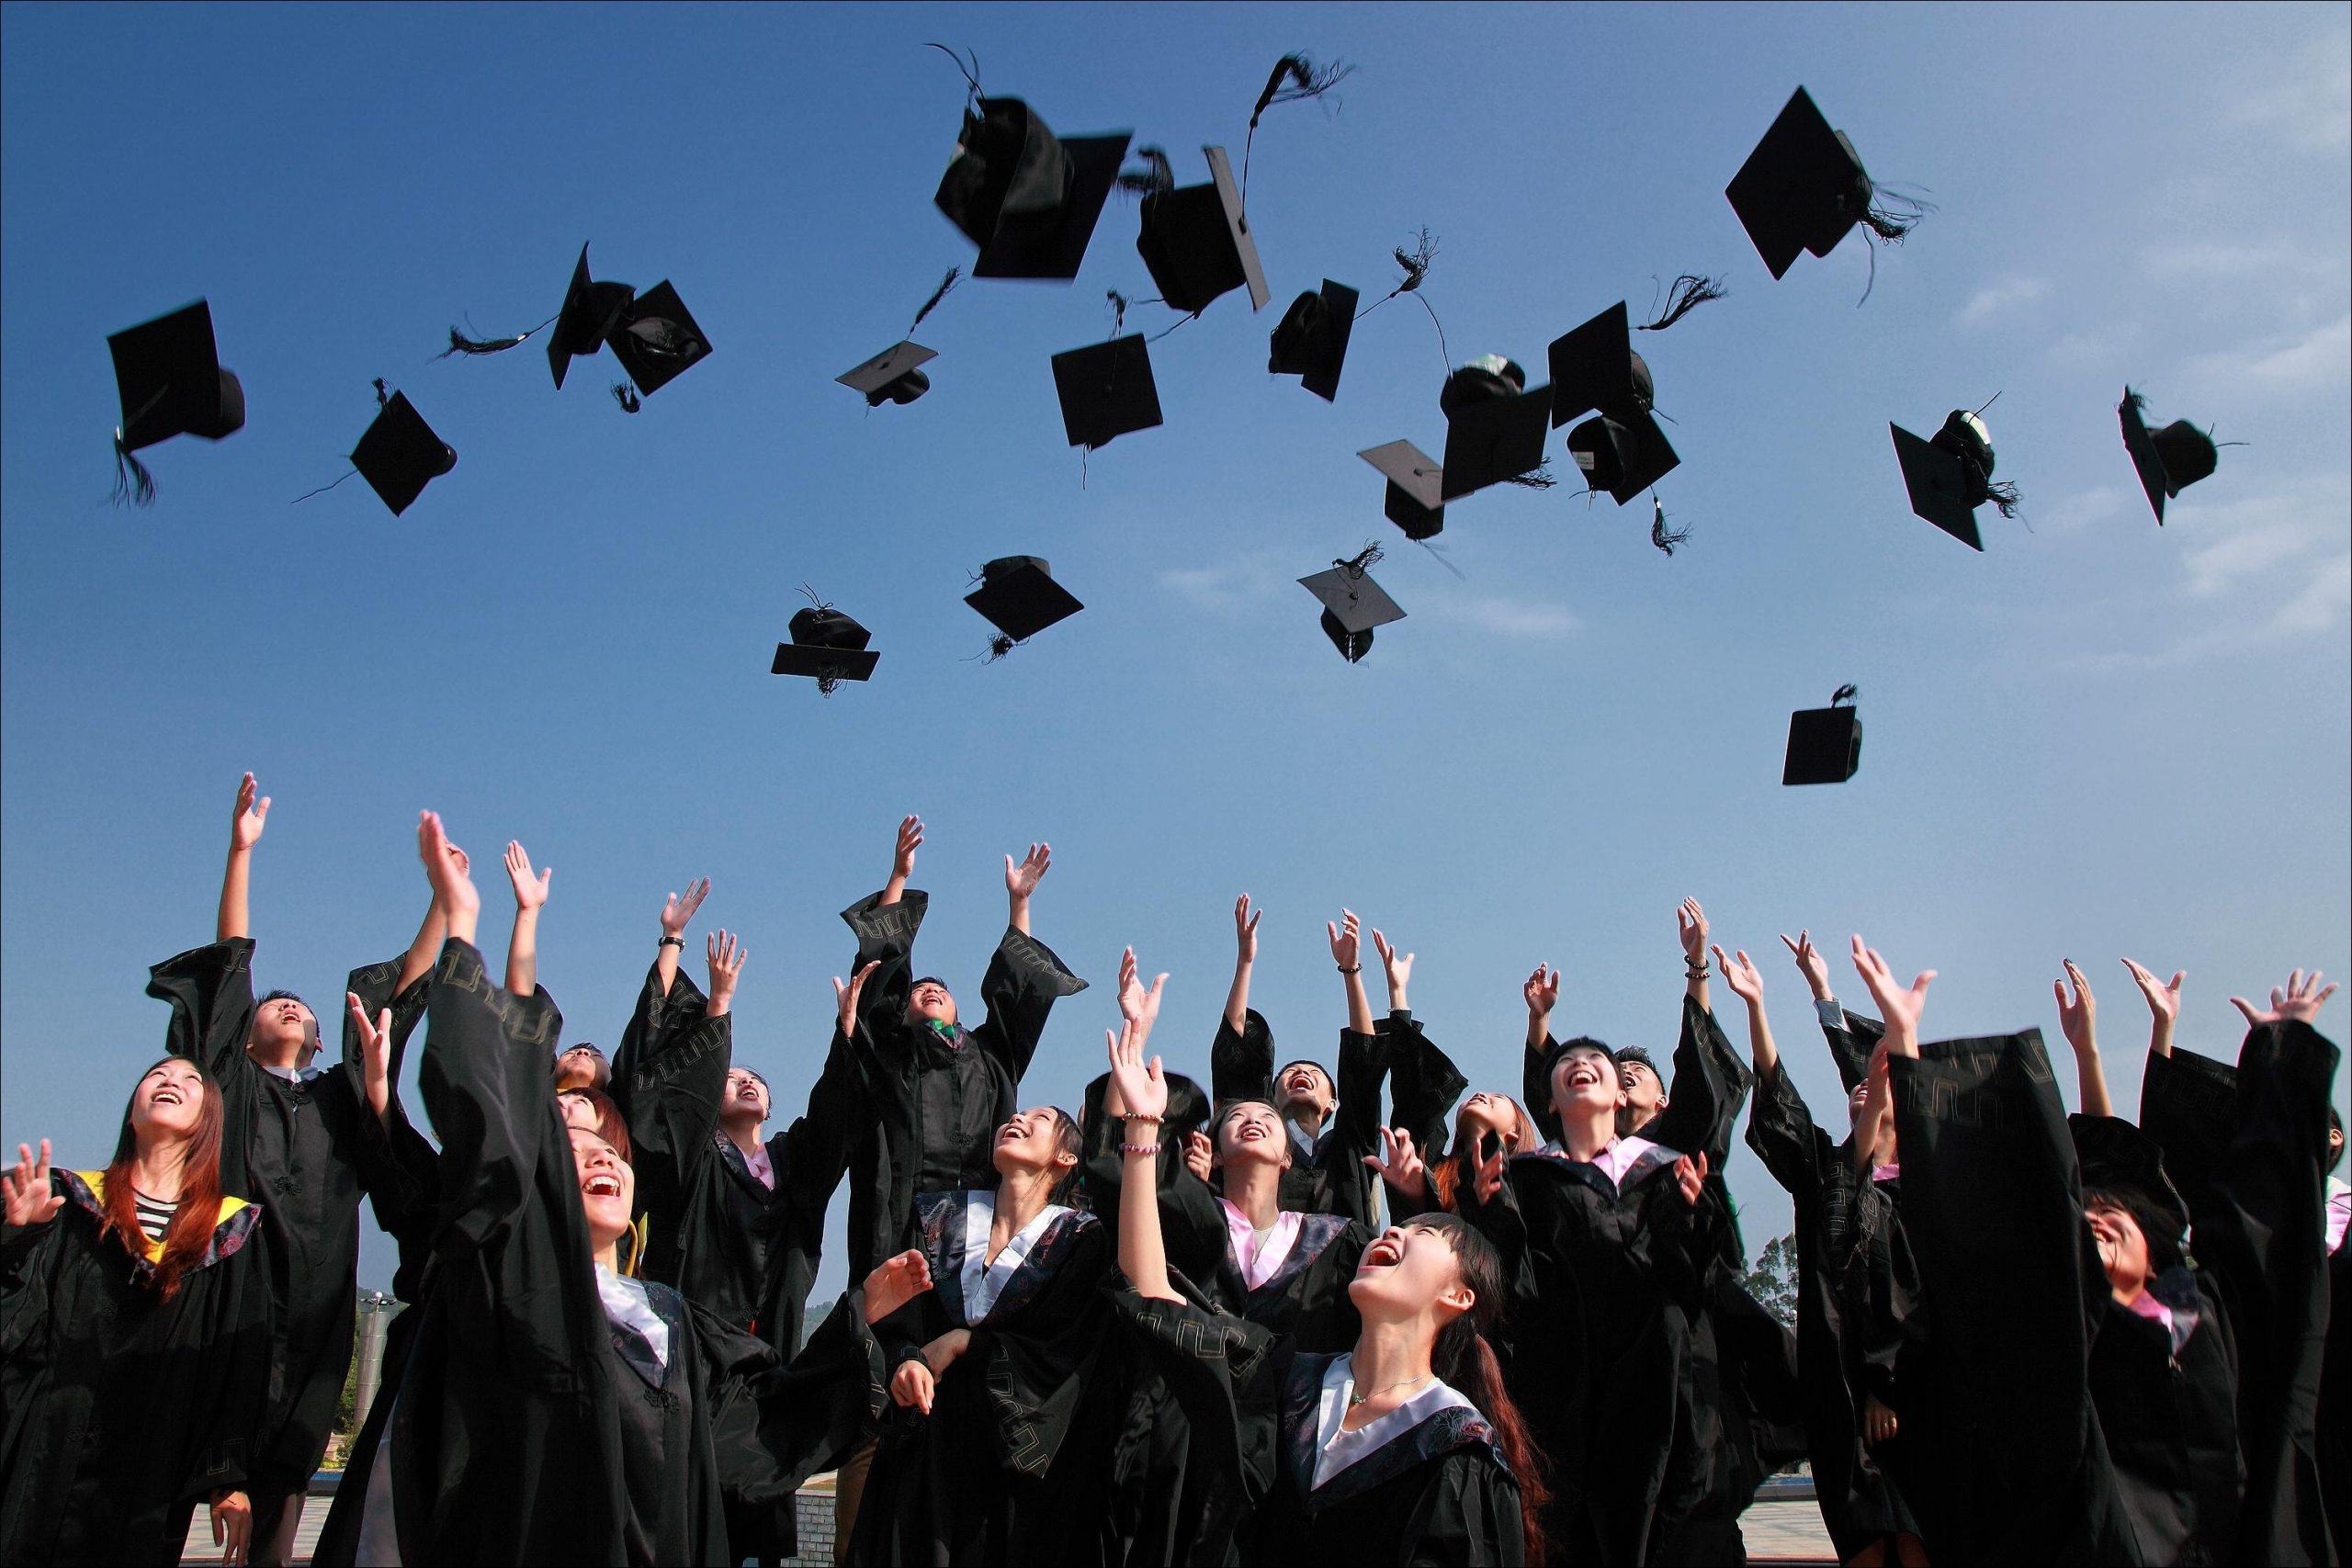 Perbedaan Pendidikan Sarjana dan Diploma, Wajib Tahu!